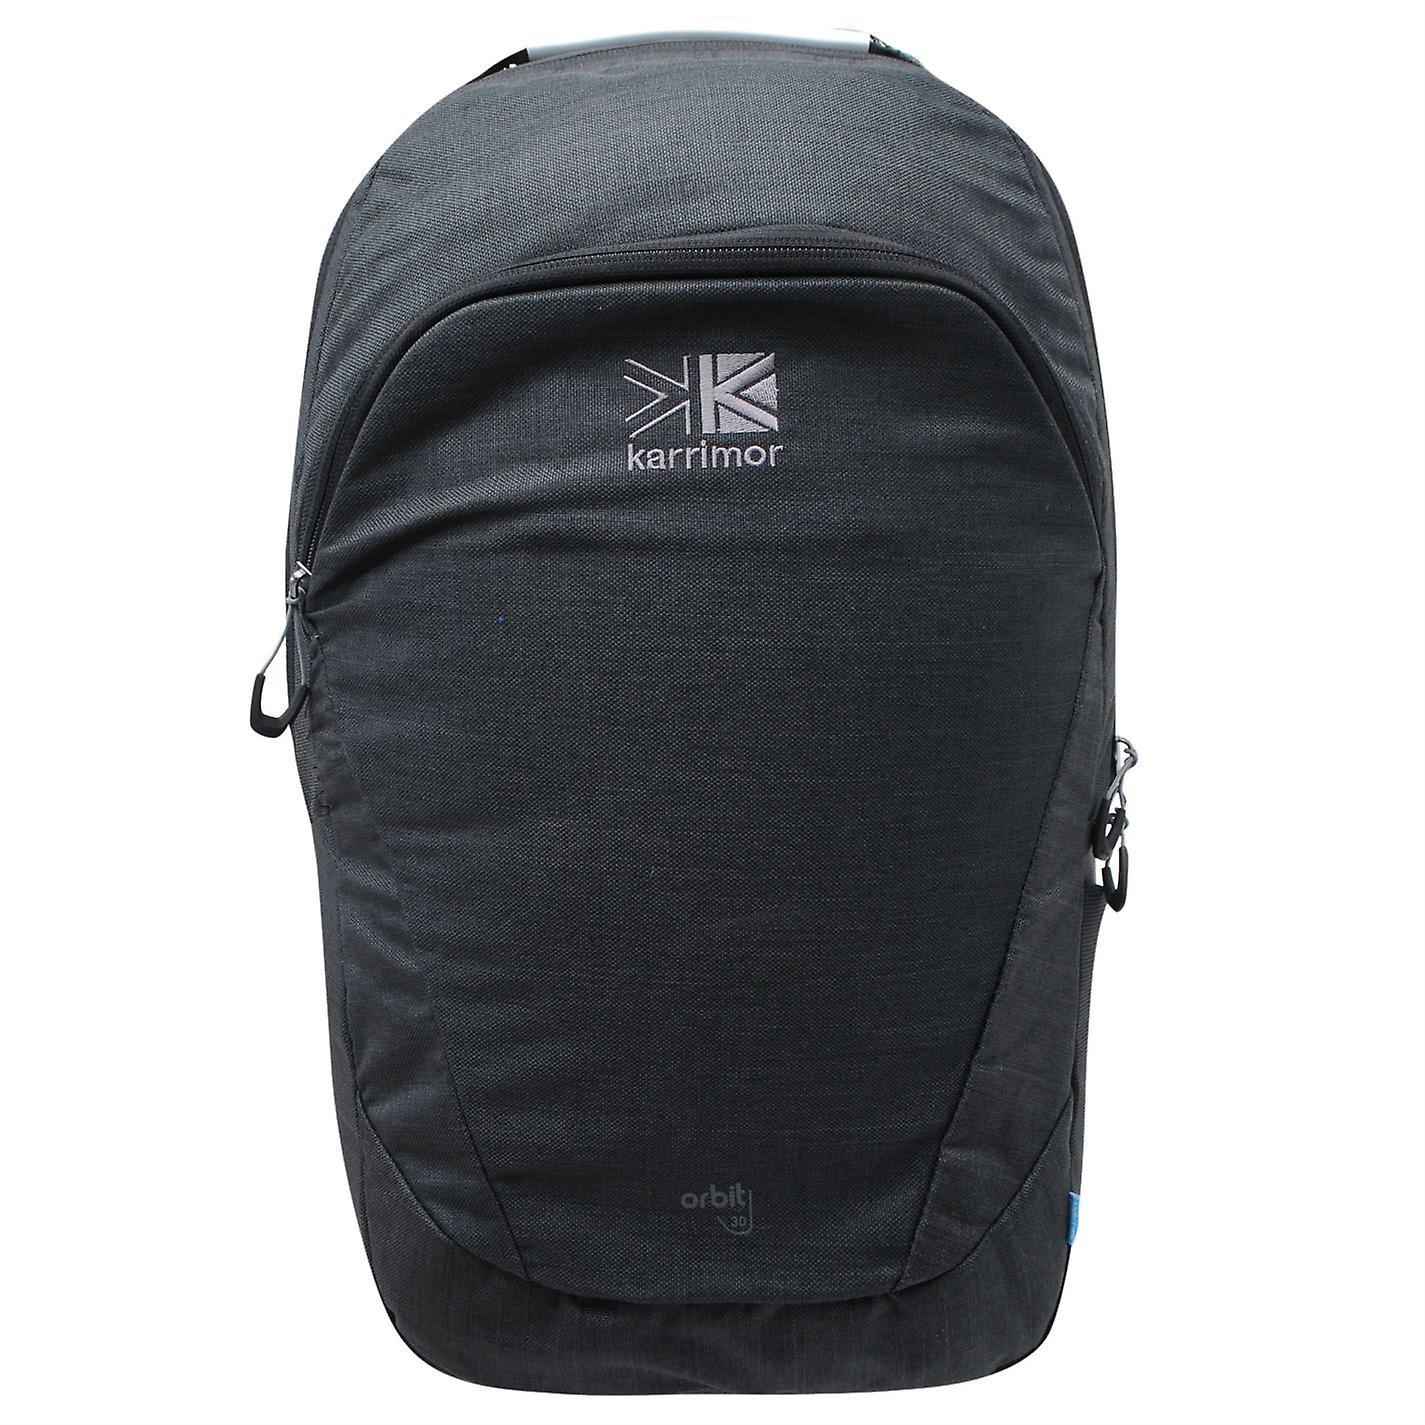 Karrimor Unisex Orbit 30 sac à dos